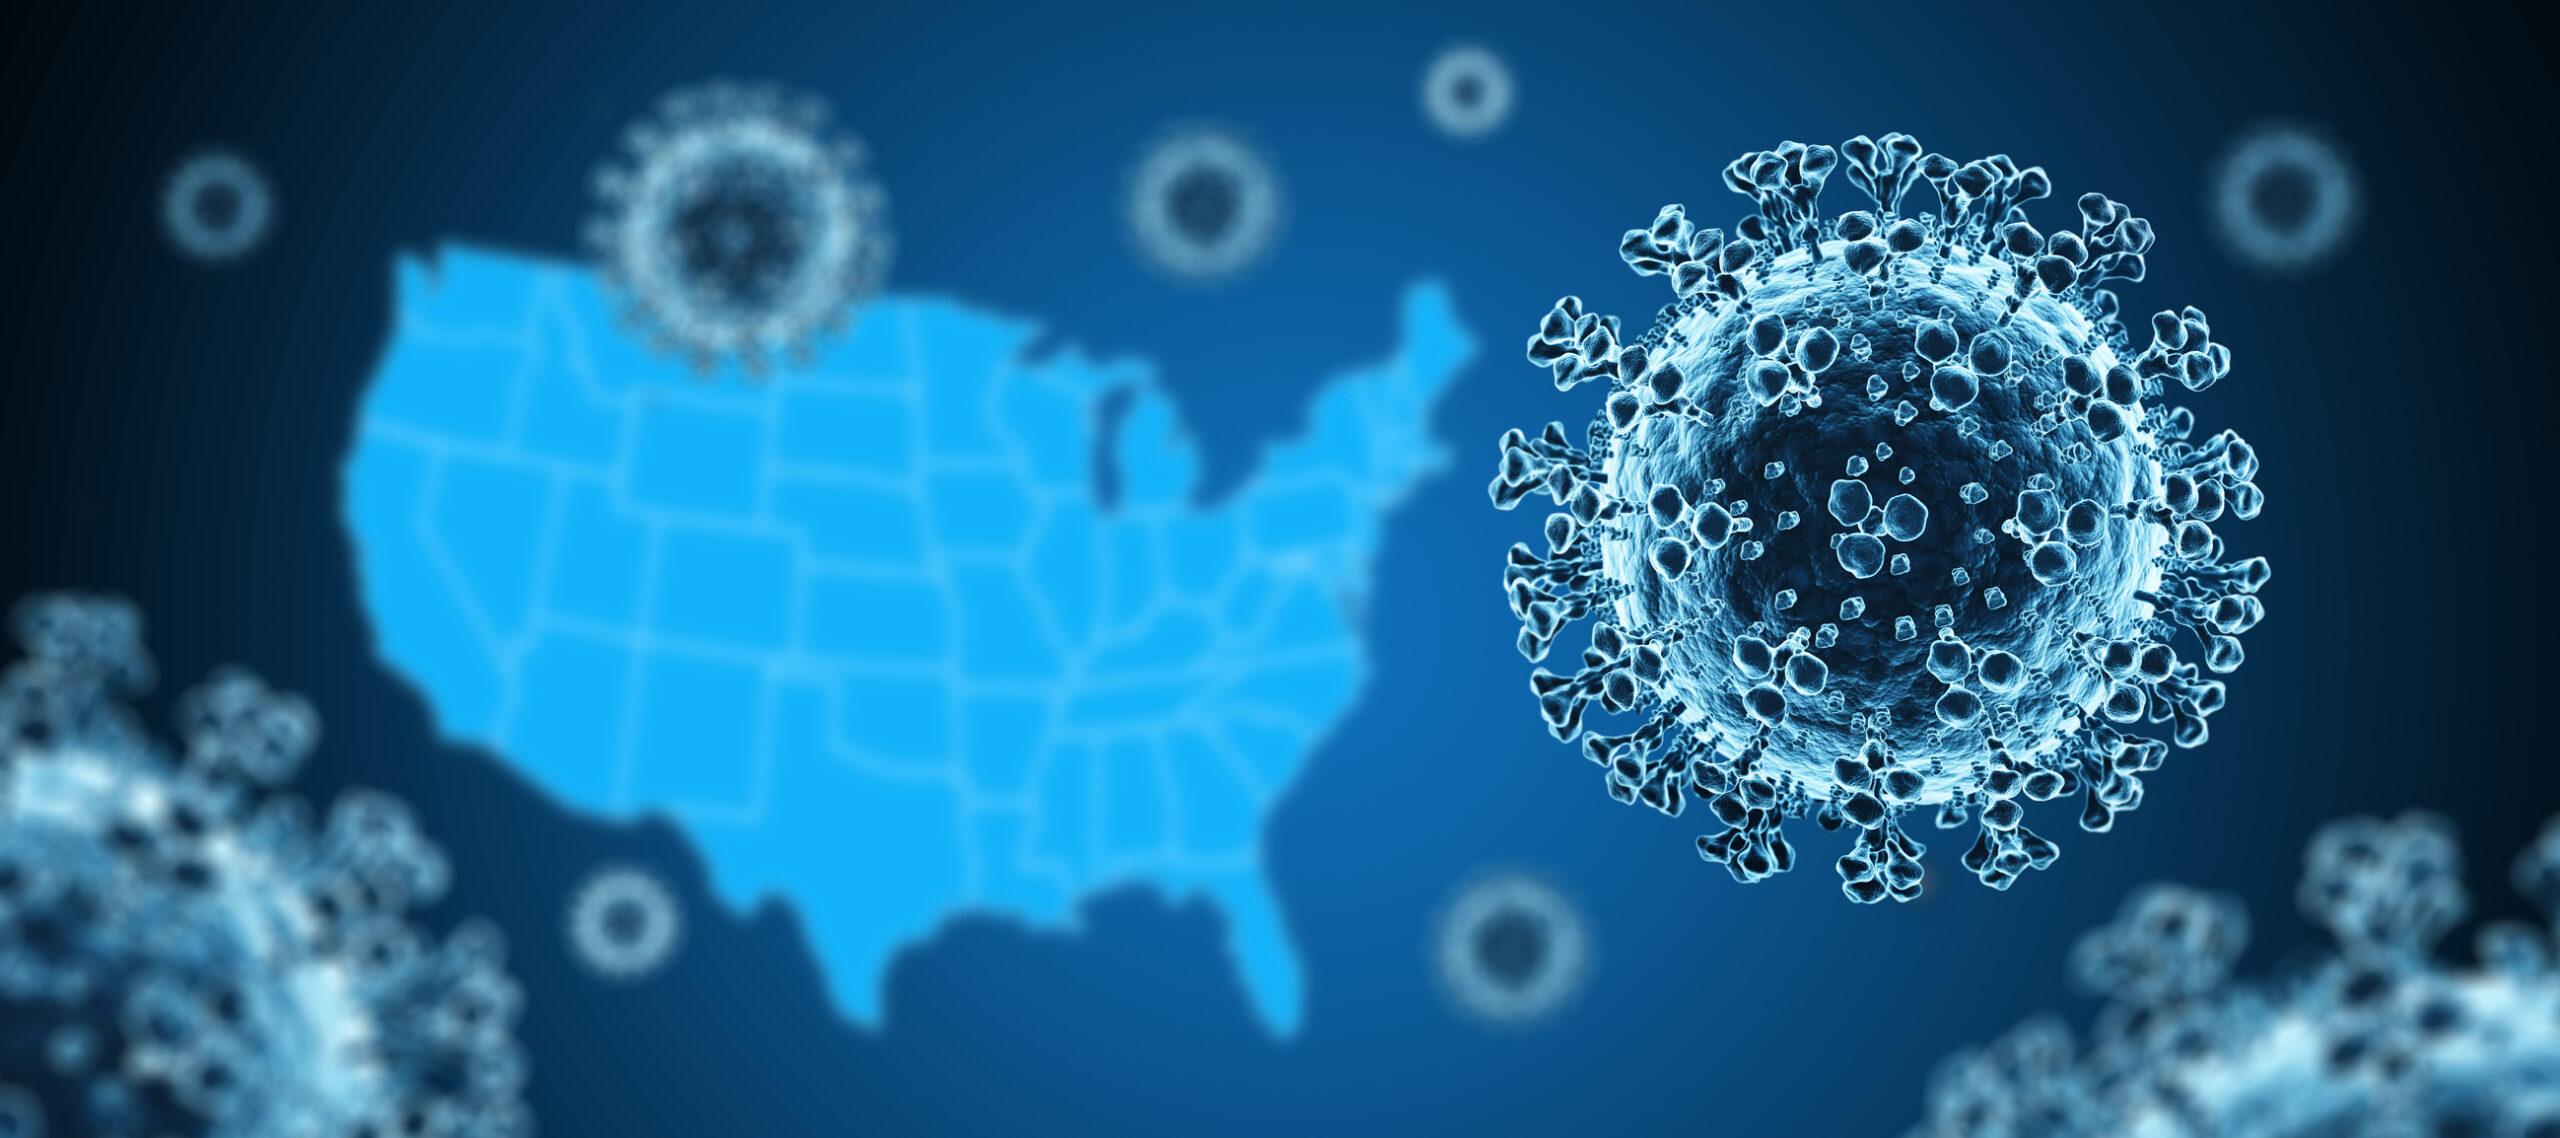 Coronavirus with US Map in background. Image credit: iStock